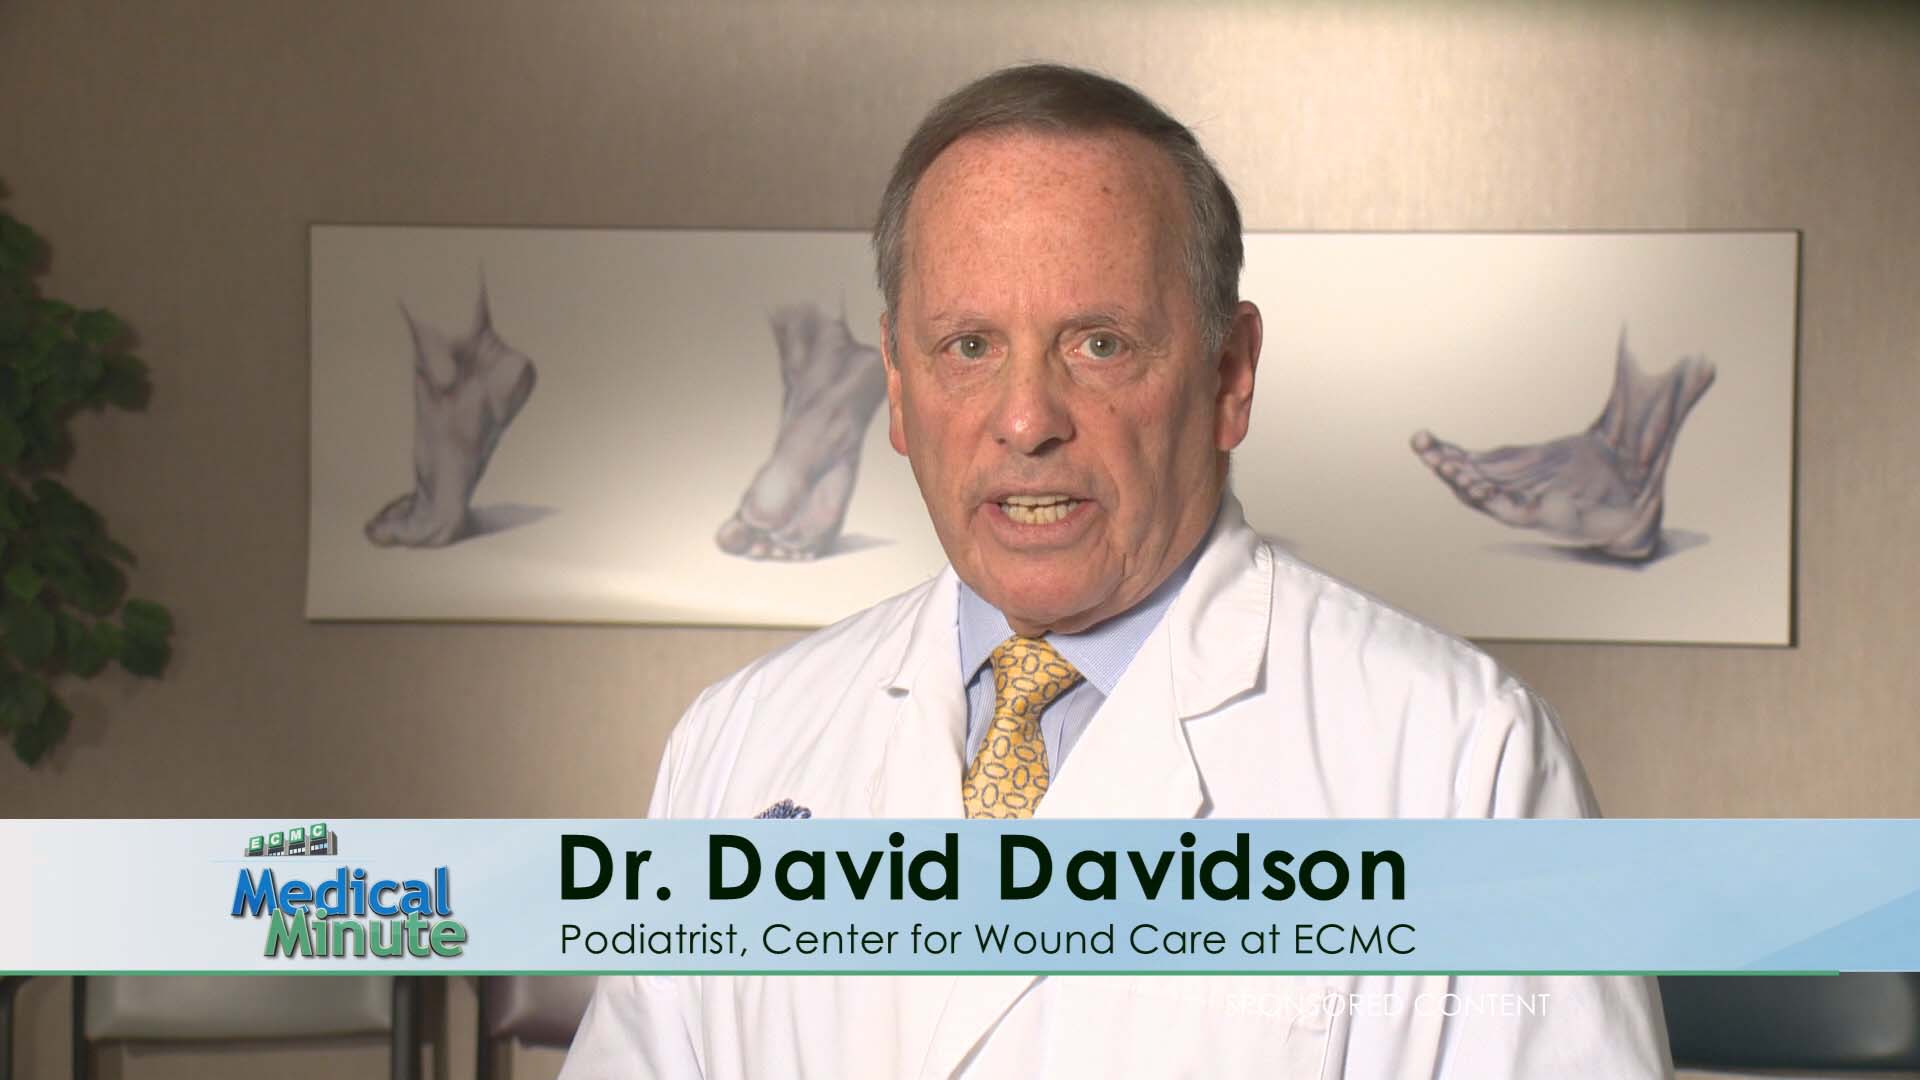 ecmc-medicalminute-drdavidson-woundcare-09-12-16